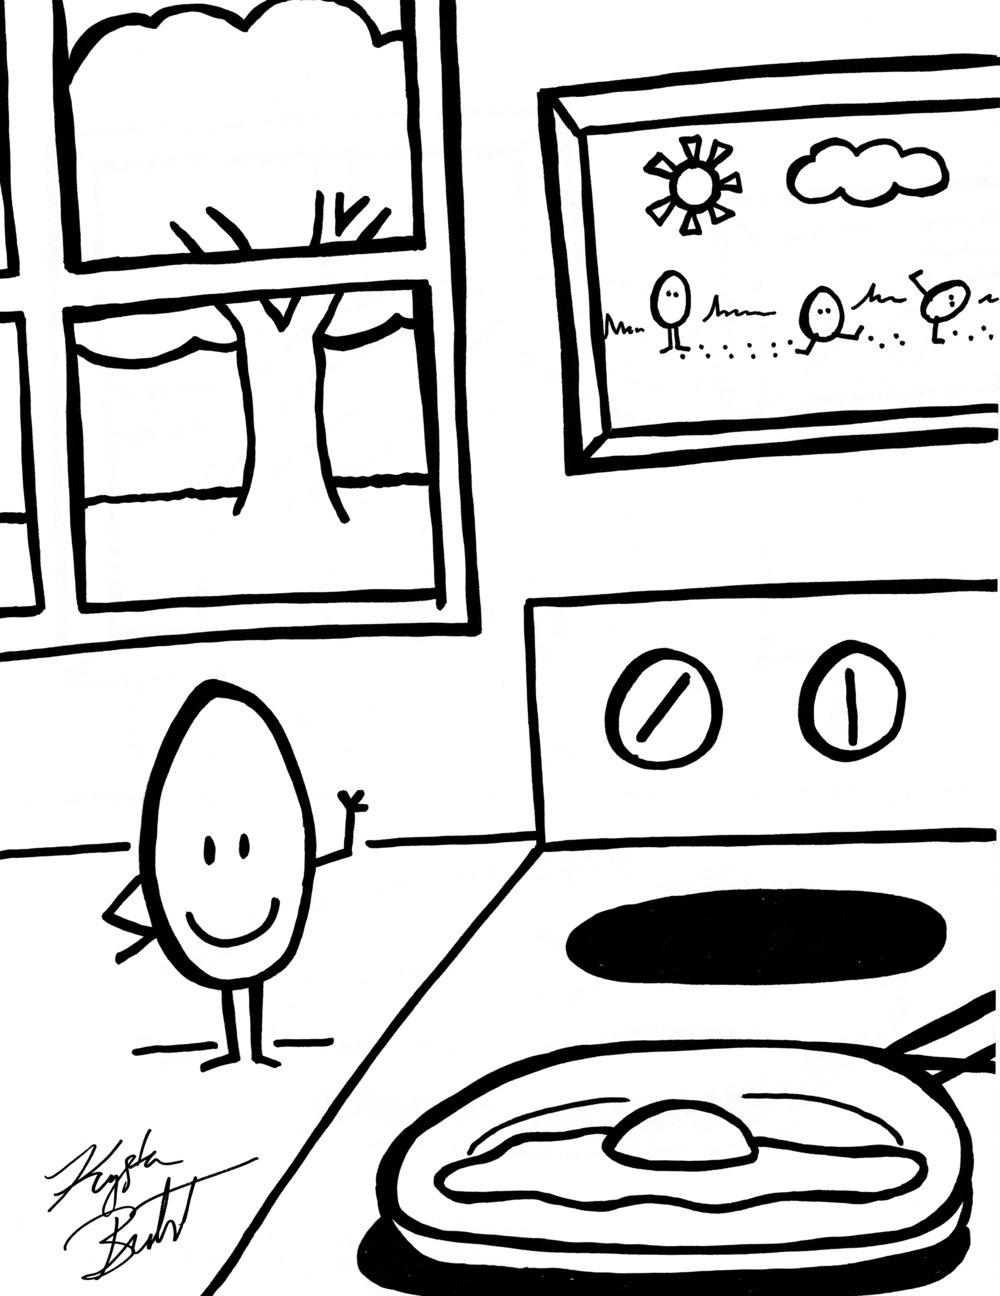 E_Eggs.jpg